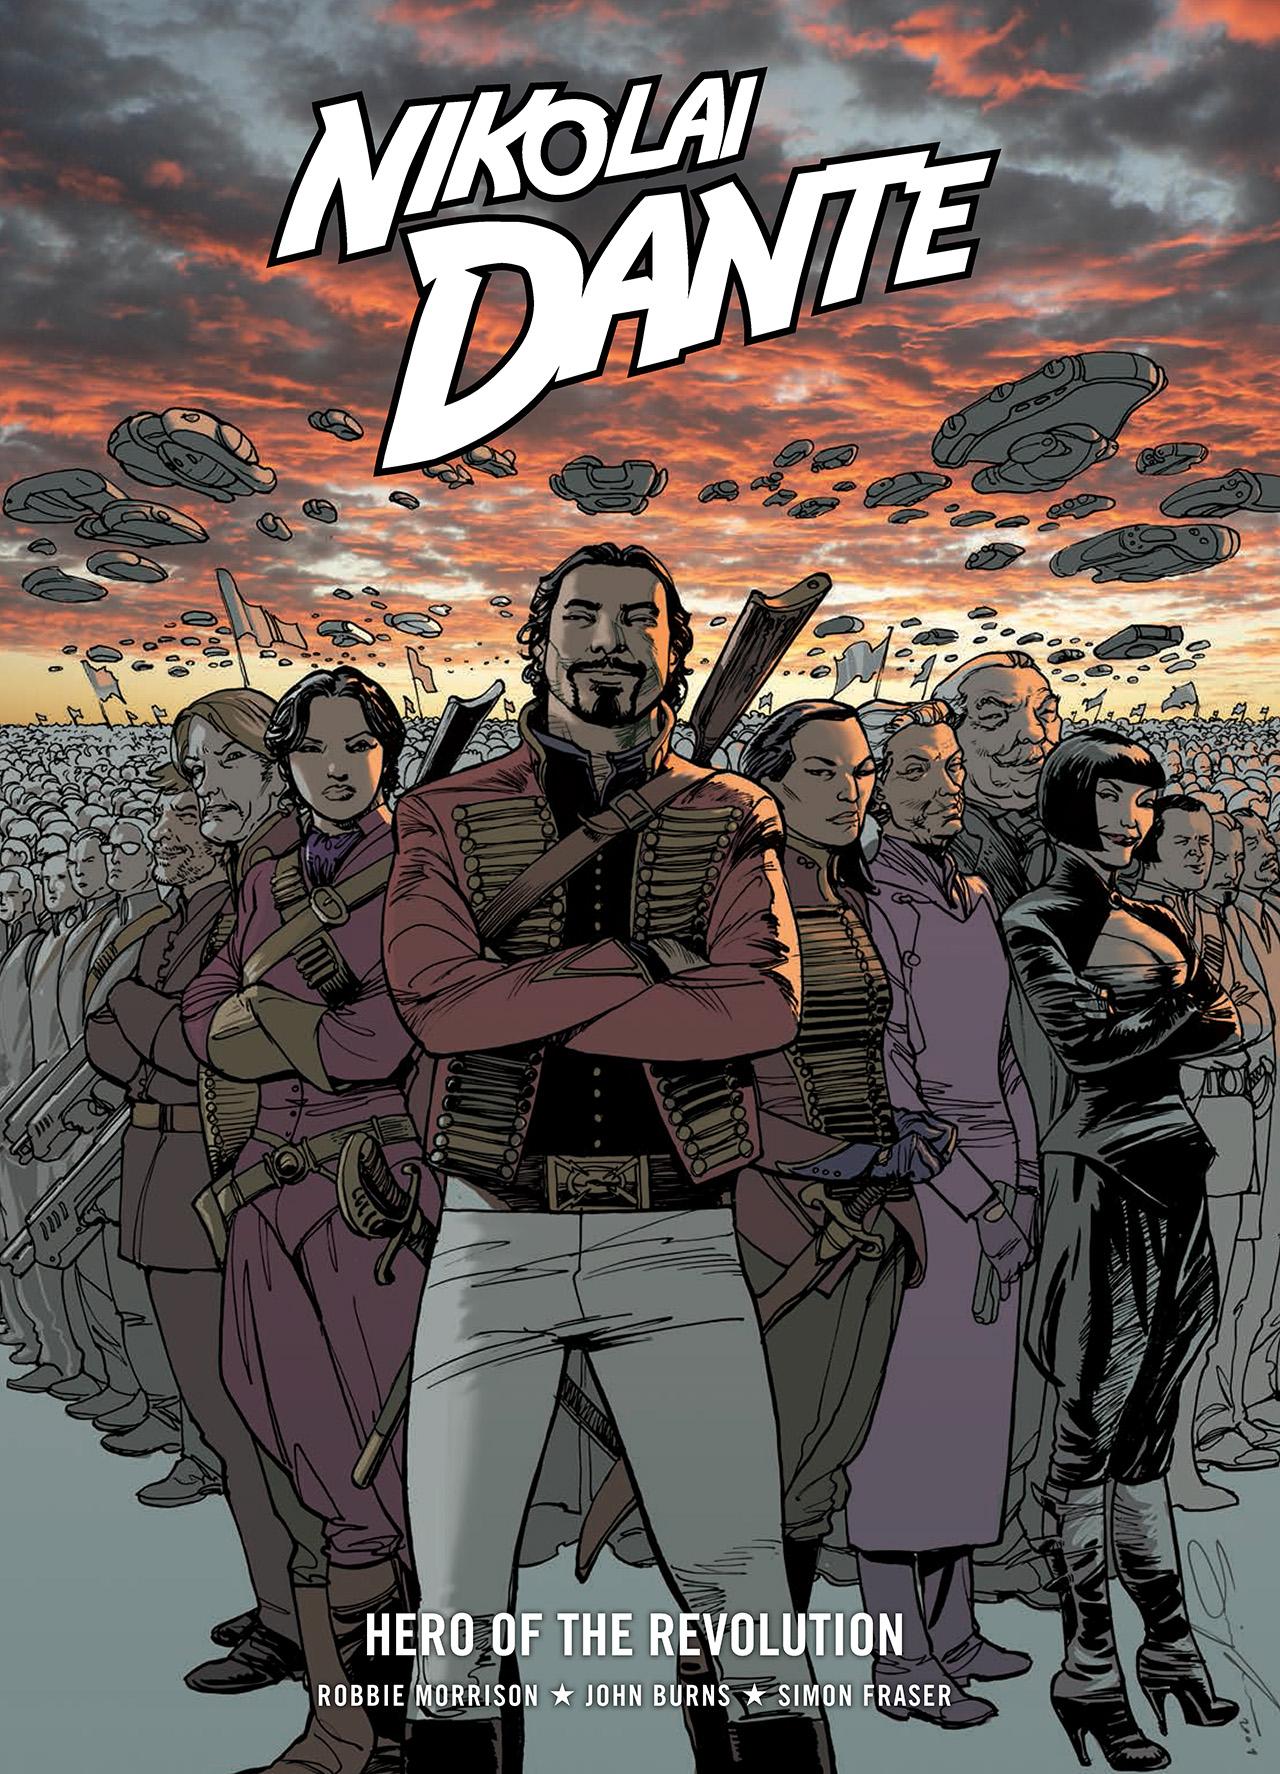 Read online Nikolai Dante comic -  Issue # TPB 10 - 1